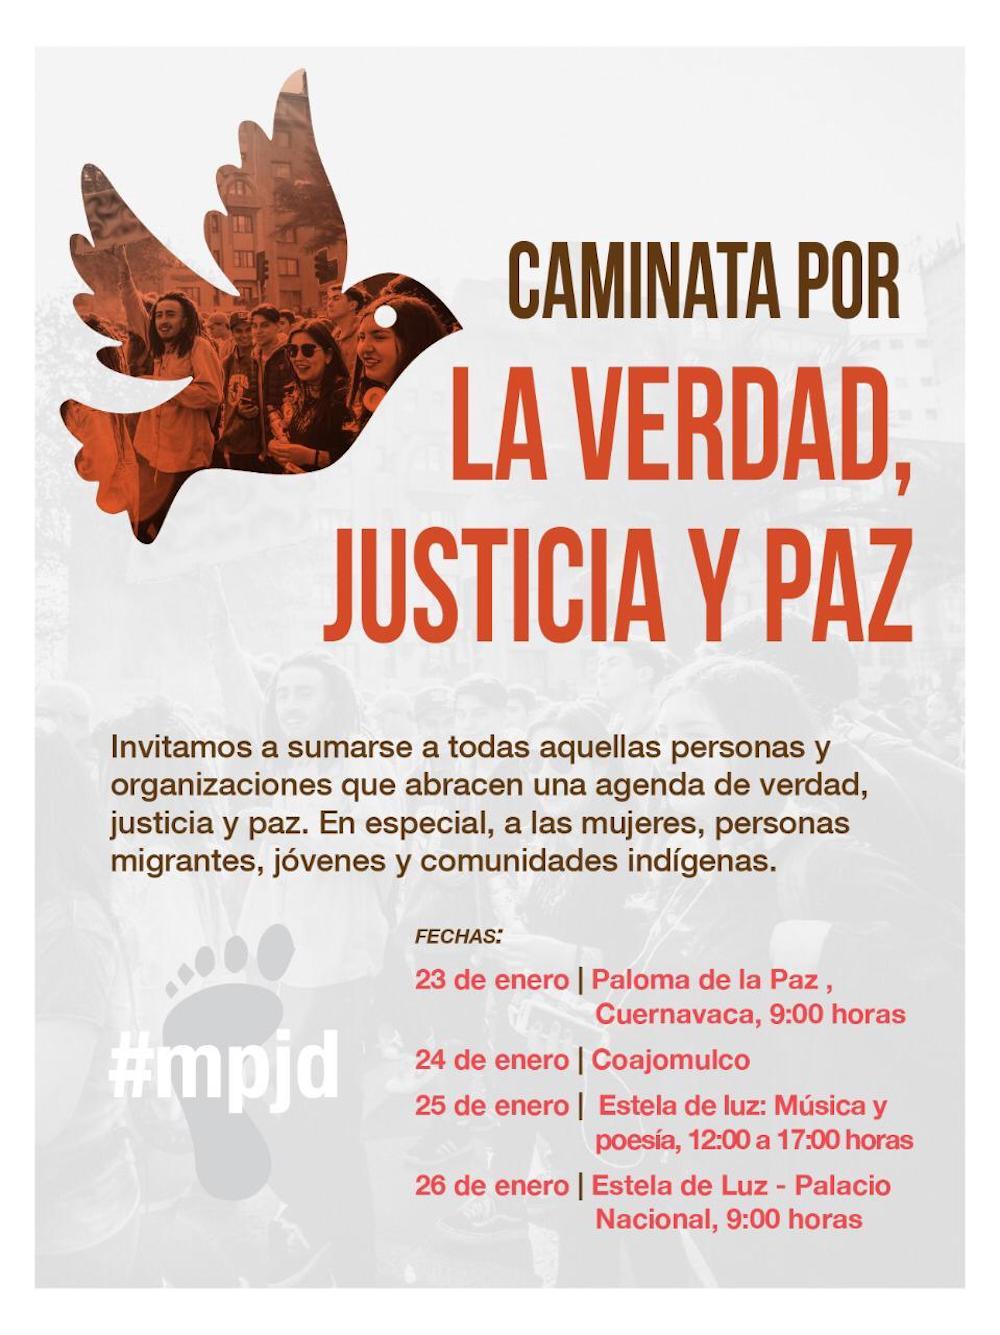 caminata-verdad-justicia-paz-sicilia